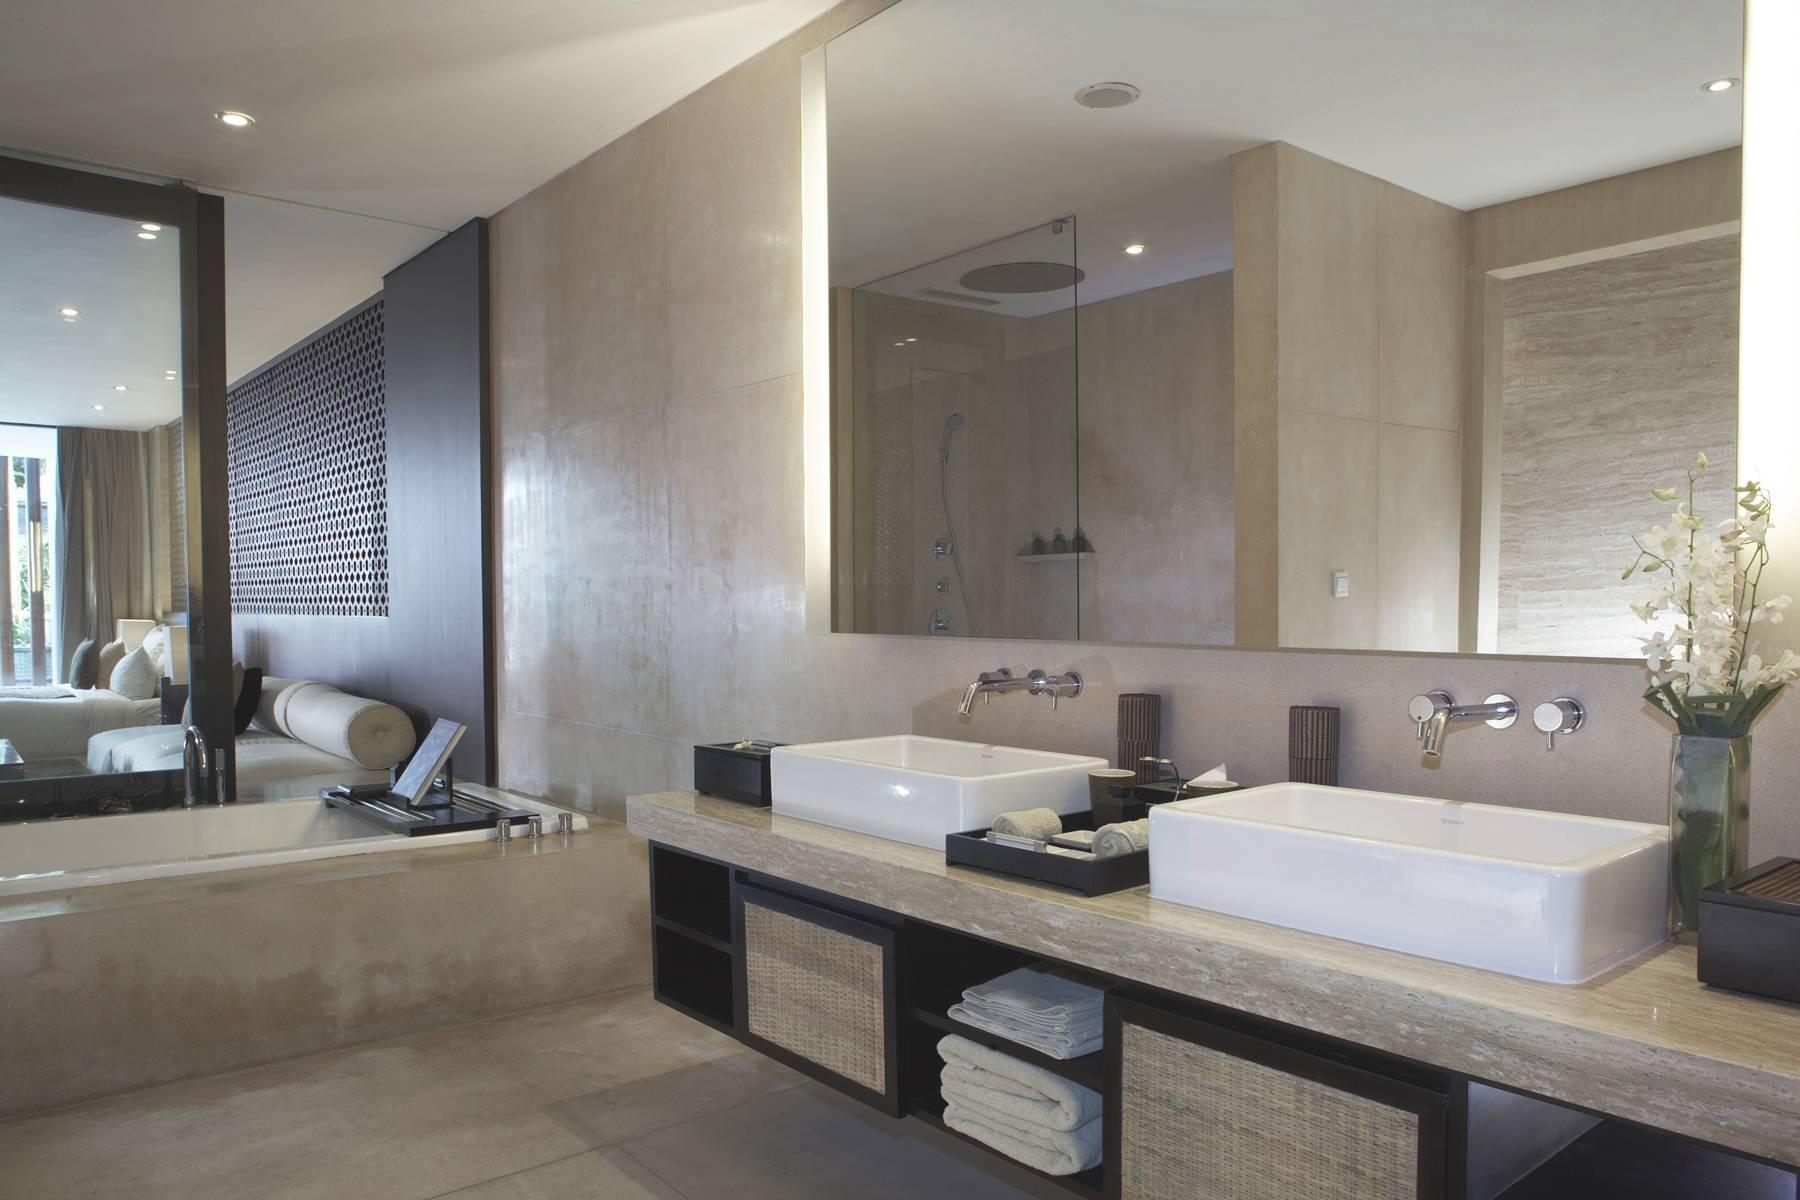 Antony Liu + Ferry Ridwan / Studio Tonton Anantara Seminyak Bali Resort Seminyak, Bali, Indonesia Seminyak, Bali, Indonesia Bathroom Resort Modern  8033